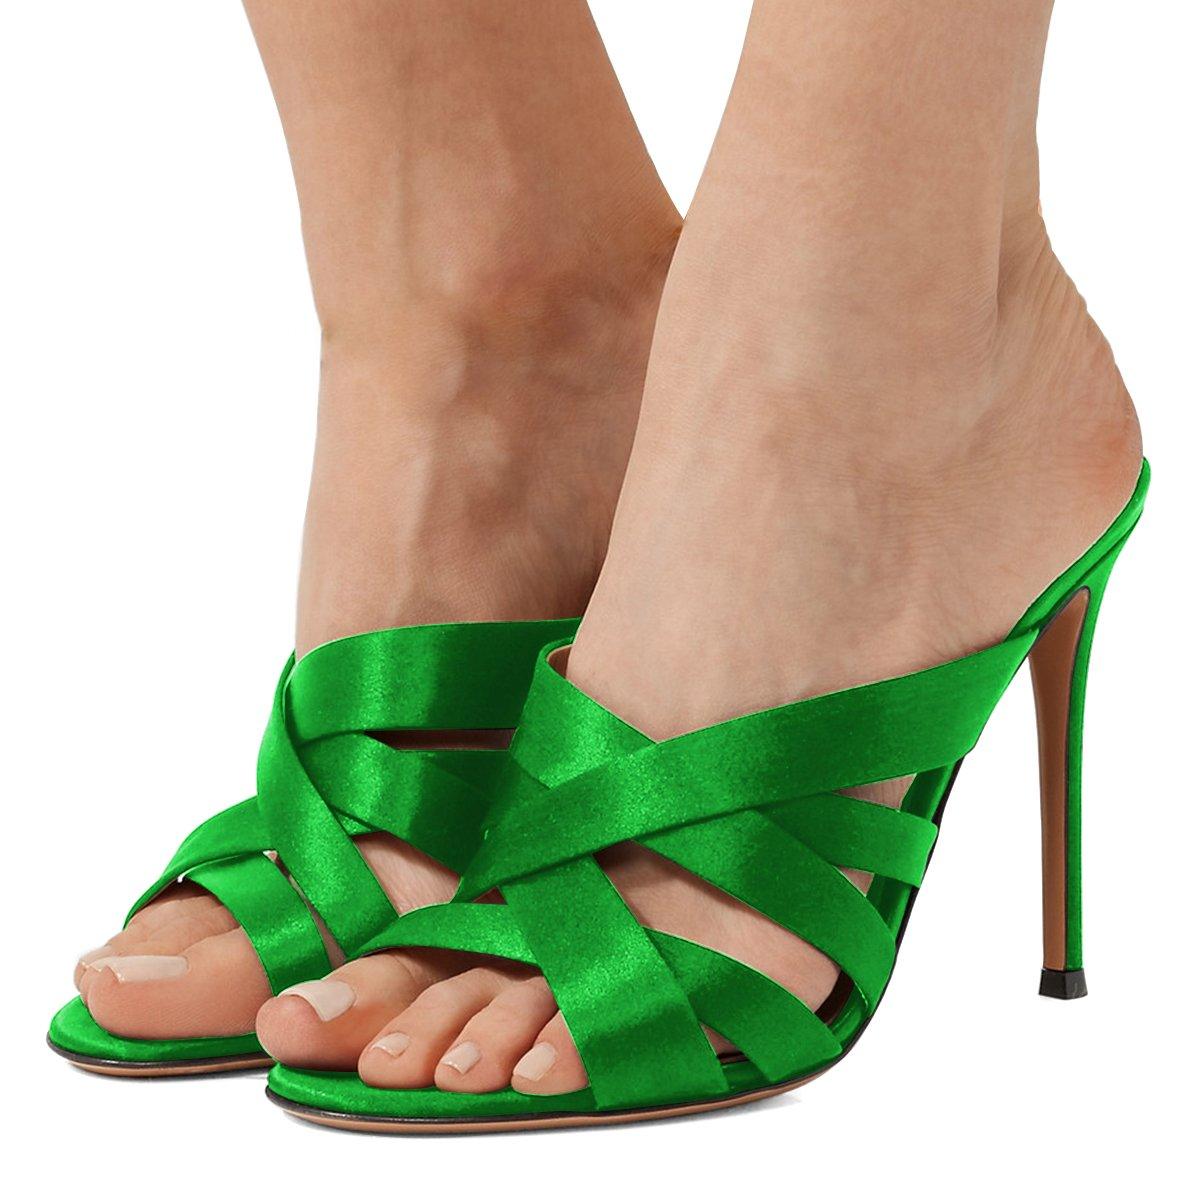 FSJ Women Strappy Satin Open Toe Sandals Stiletto High Heels Mules Slip On Shoes Size 4-15 US